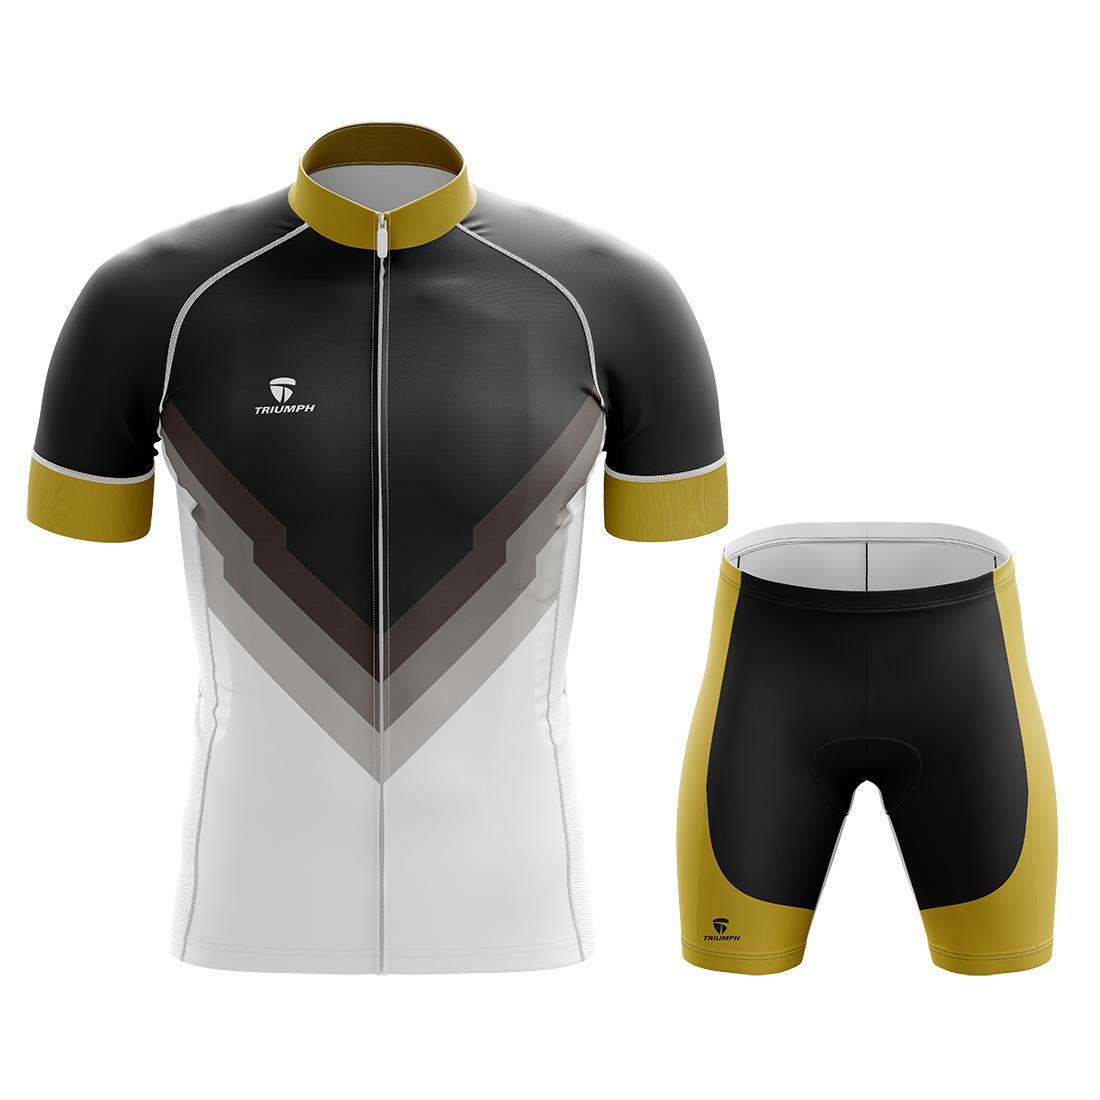 Mens Cycling Clothing